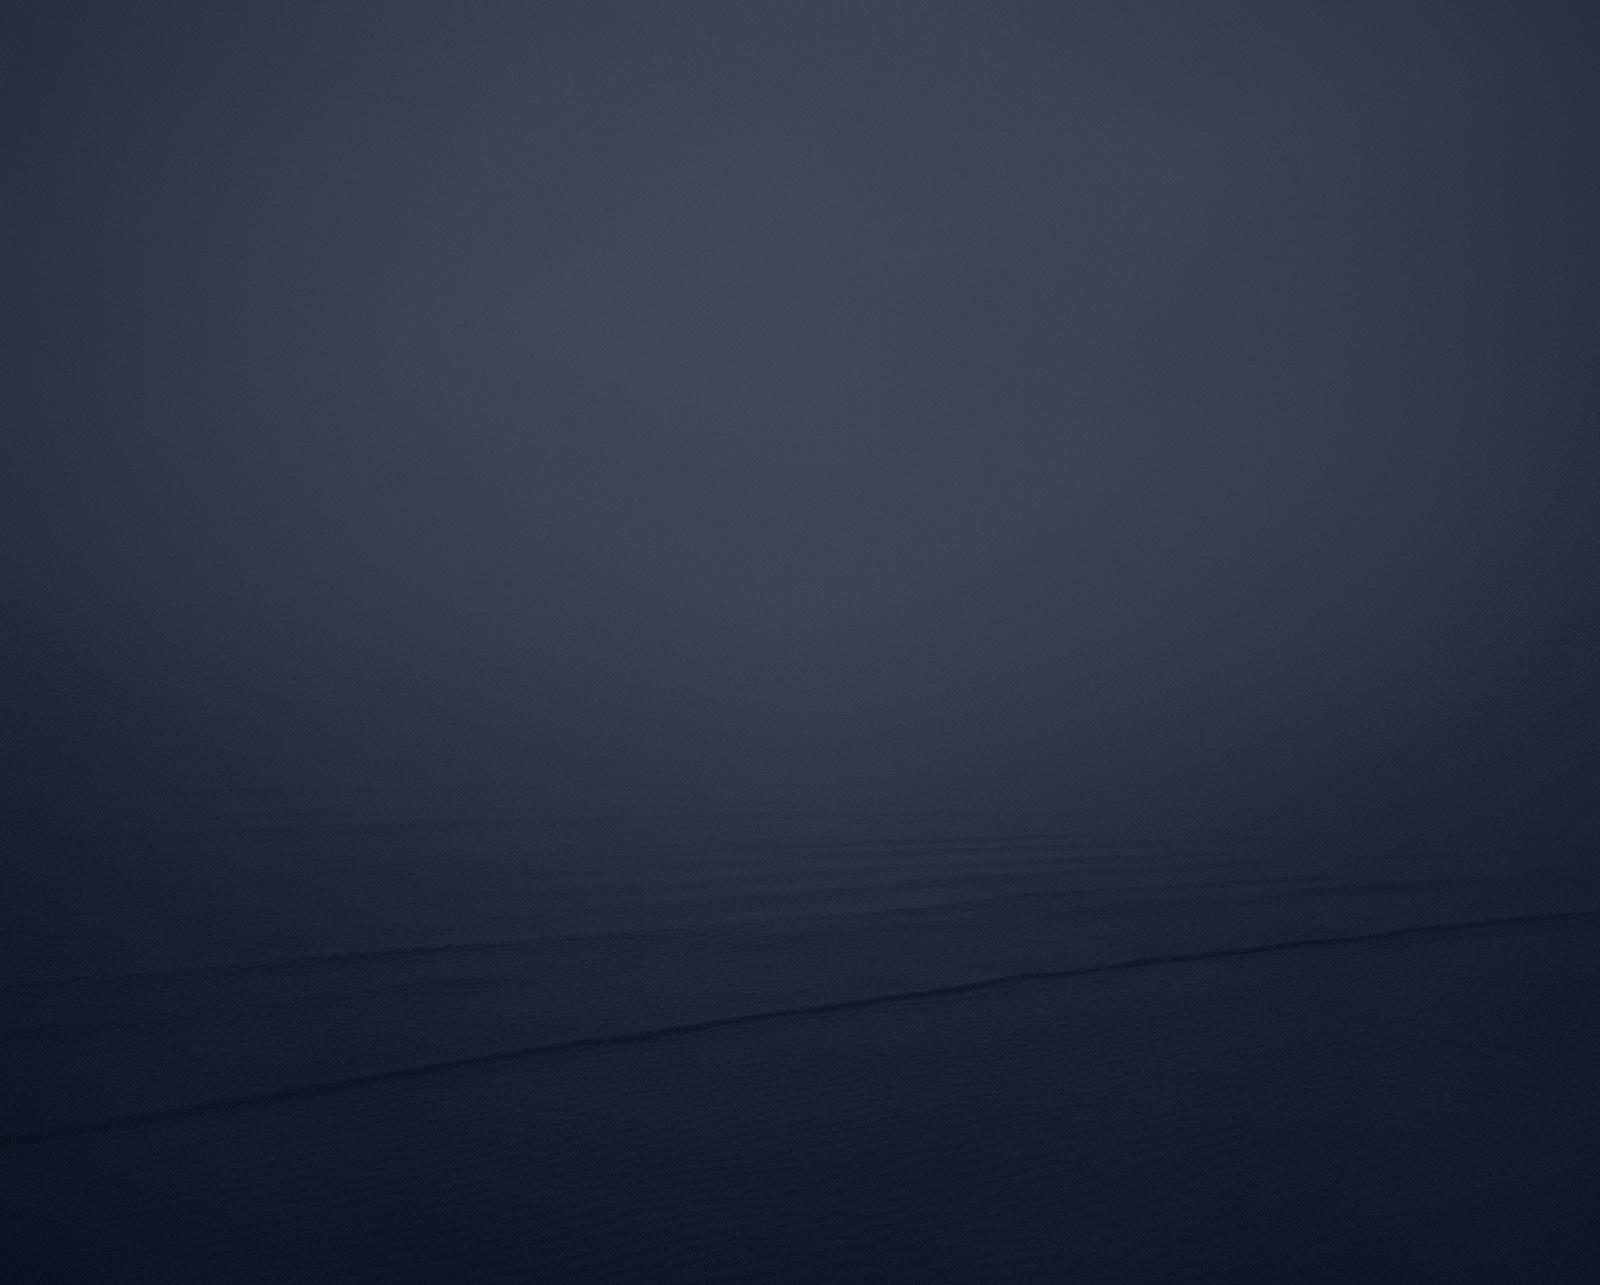 Misty dark seacape by photographer Kenneth Rimm.